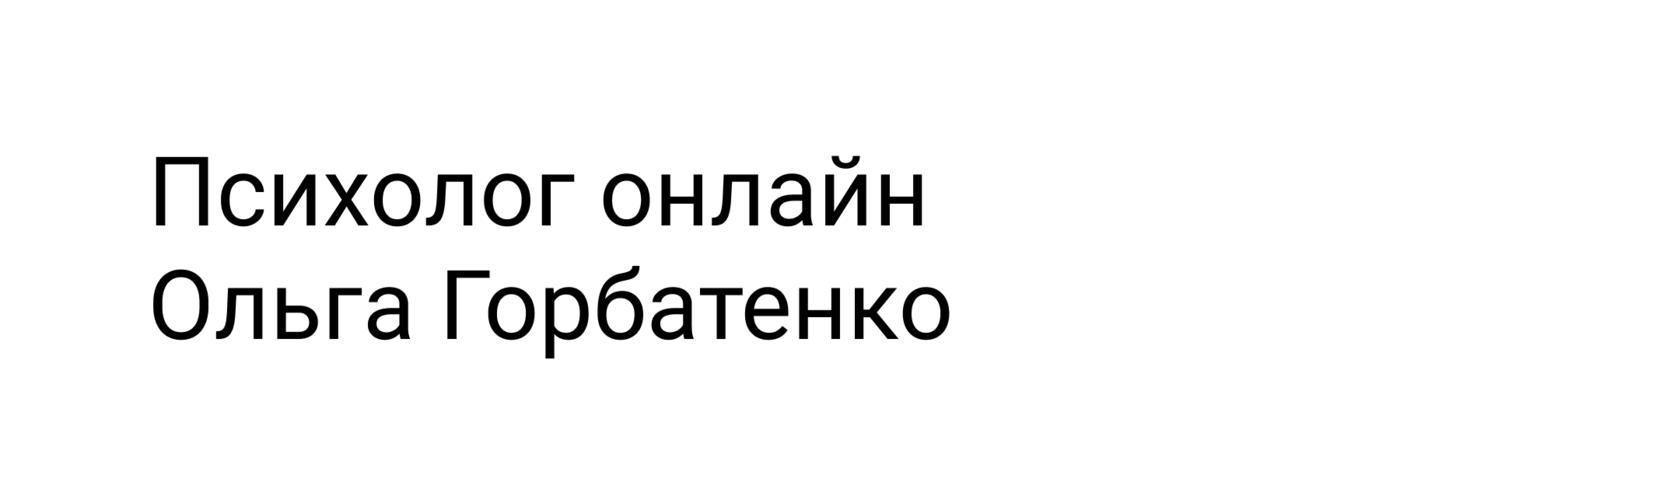 Психолог Ольга Горбатенко